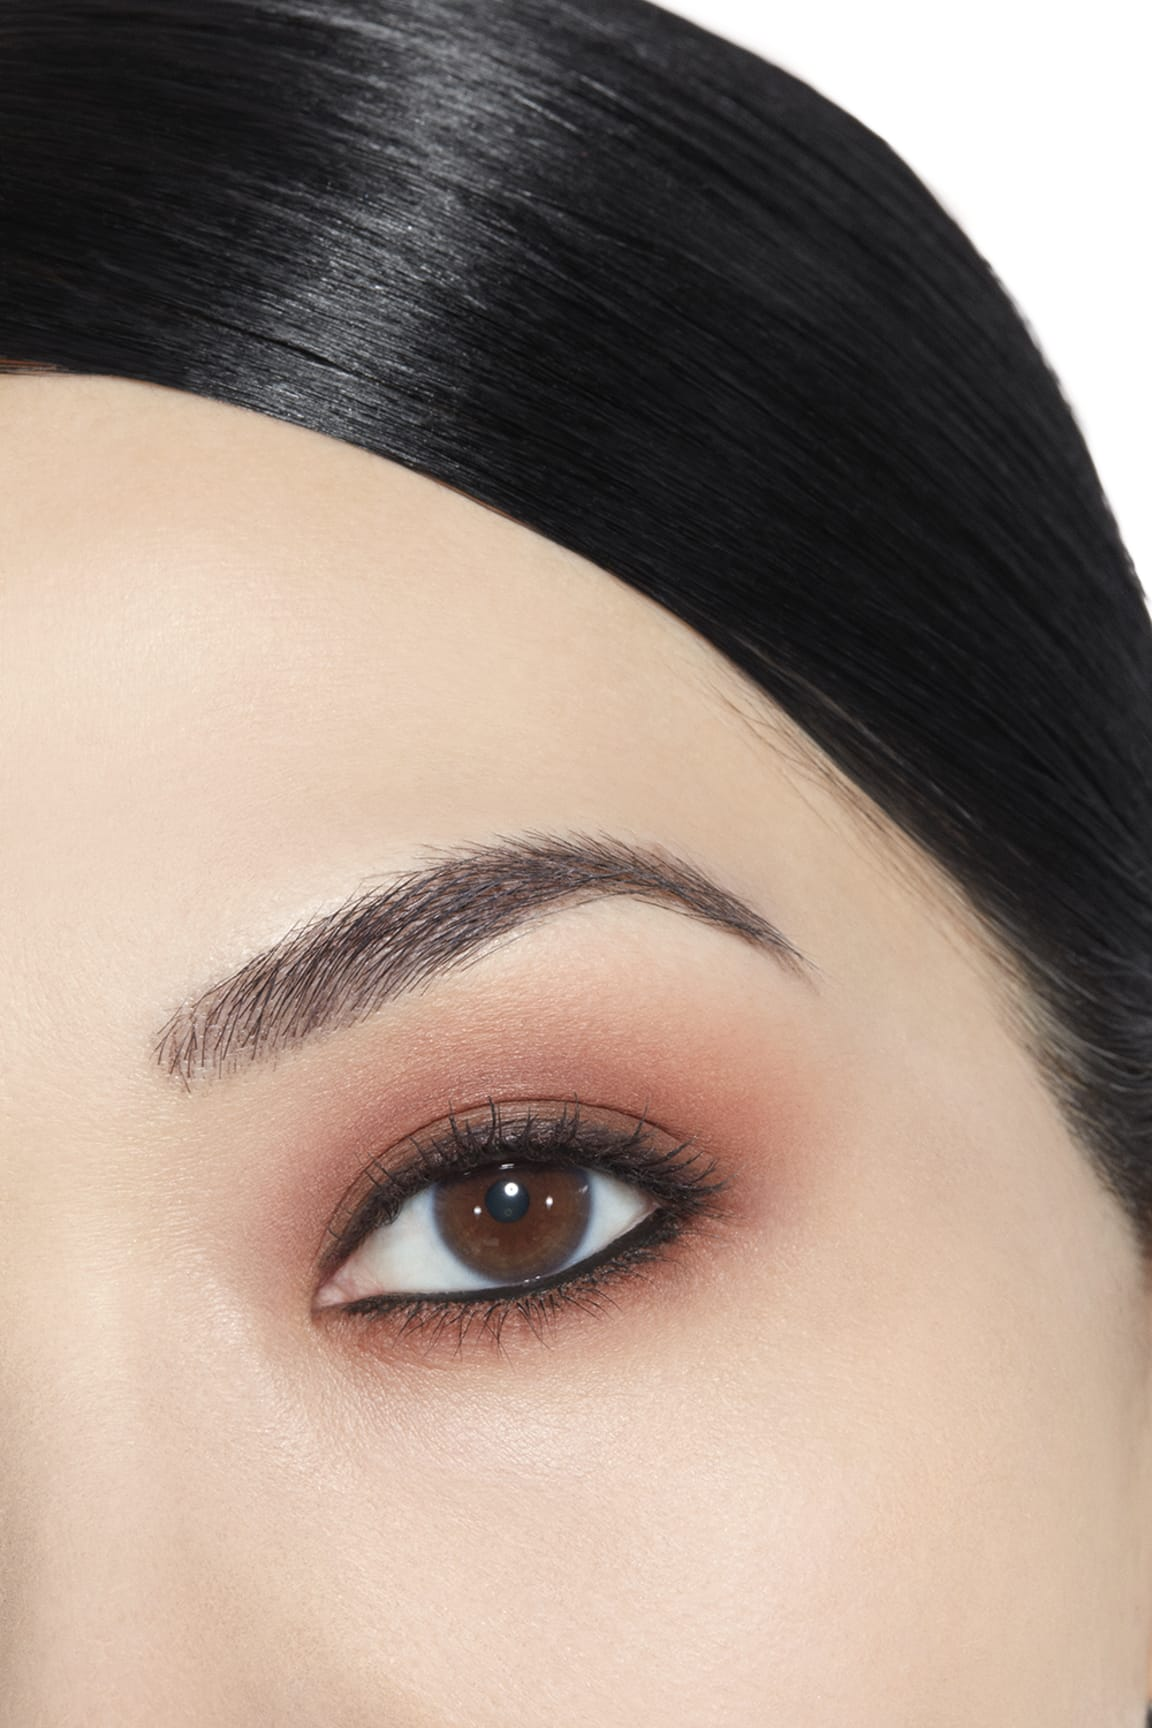 Anwendung Make-up-Bild 1 - LES 4 OMBRES 268 - CANDEUR ET EXPÉRIENCE